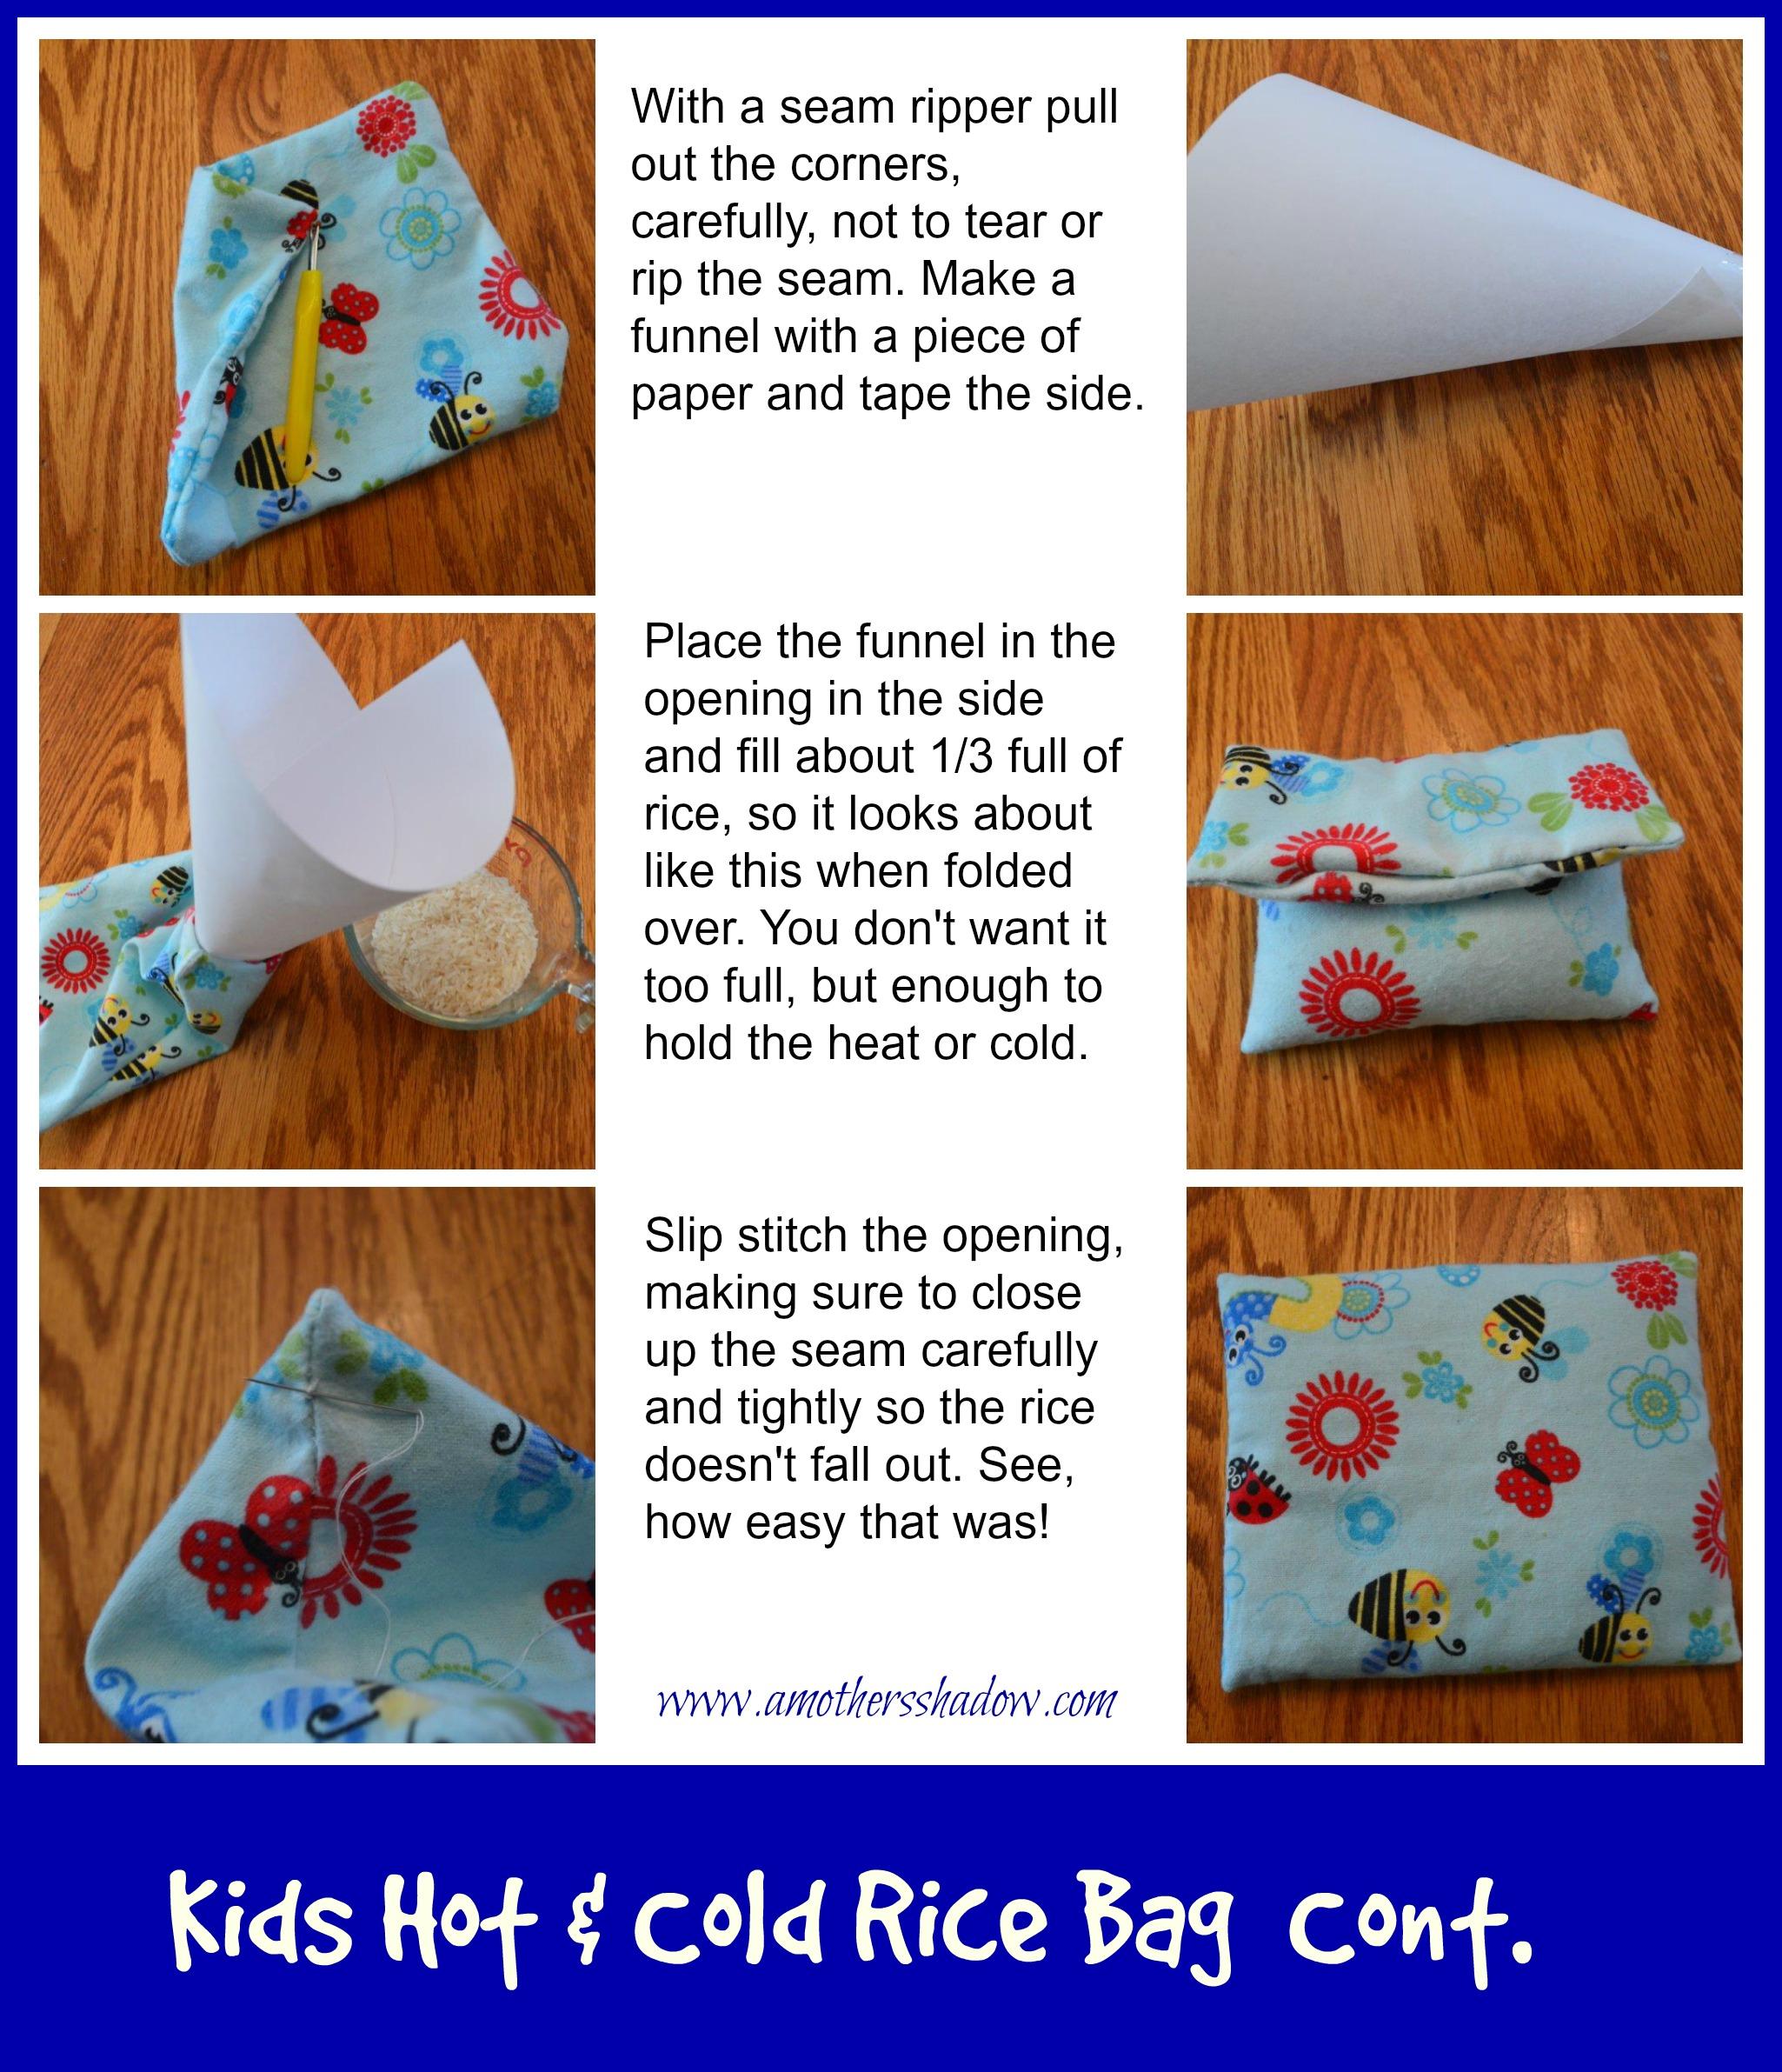 Kids Hot & Cold Rice Bag 2